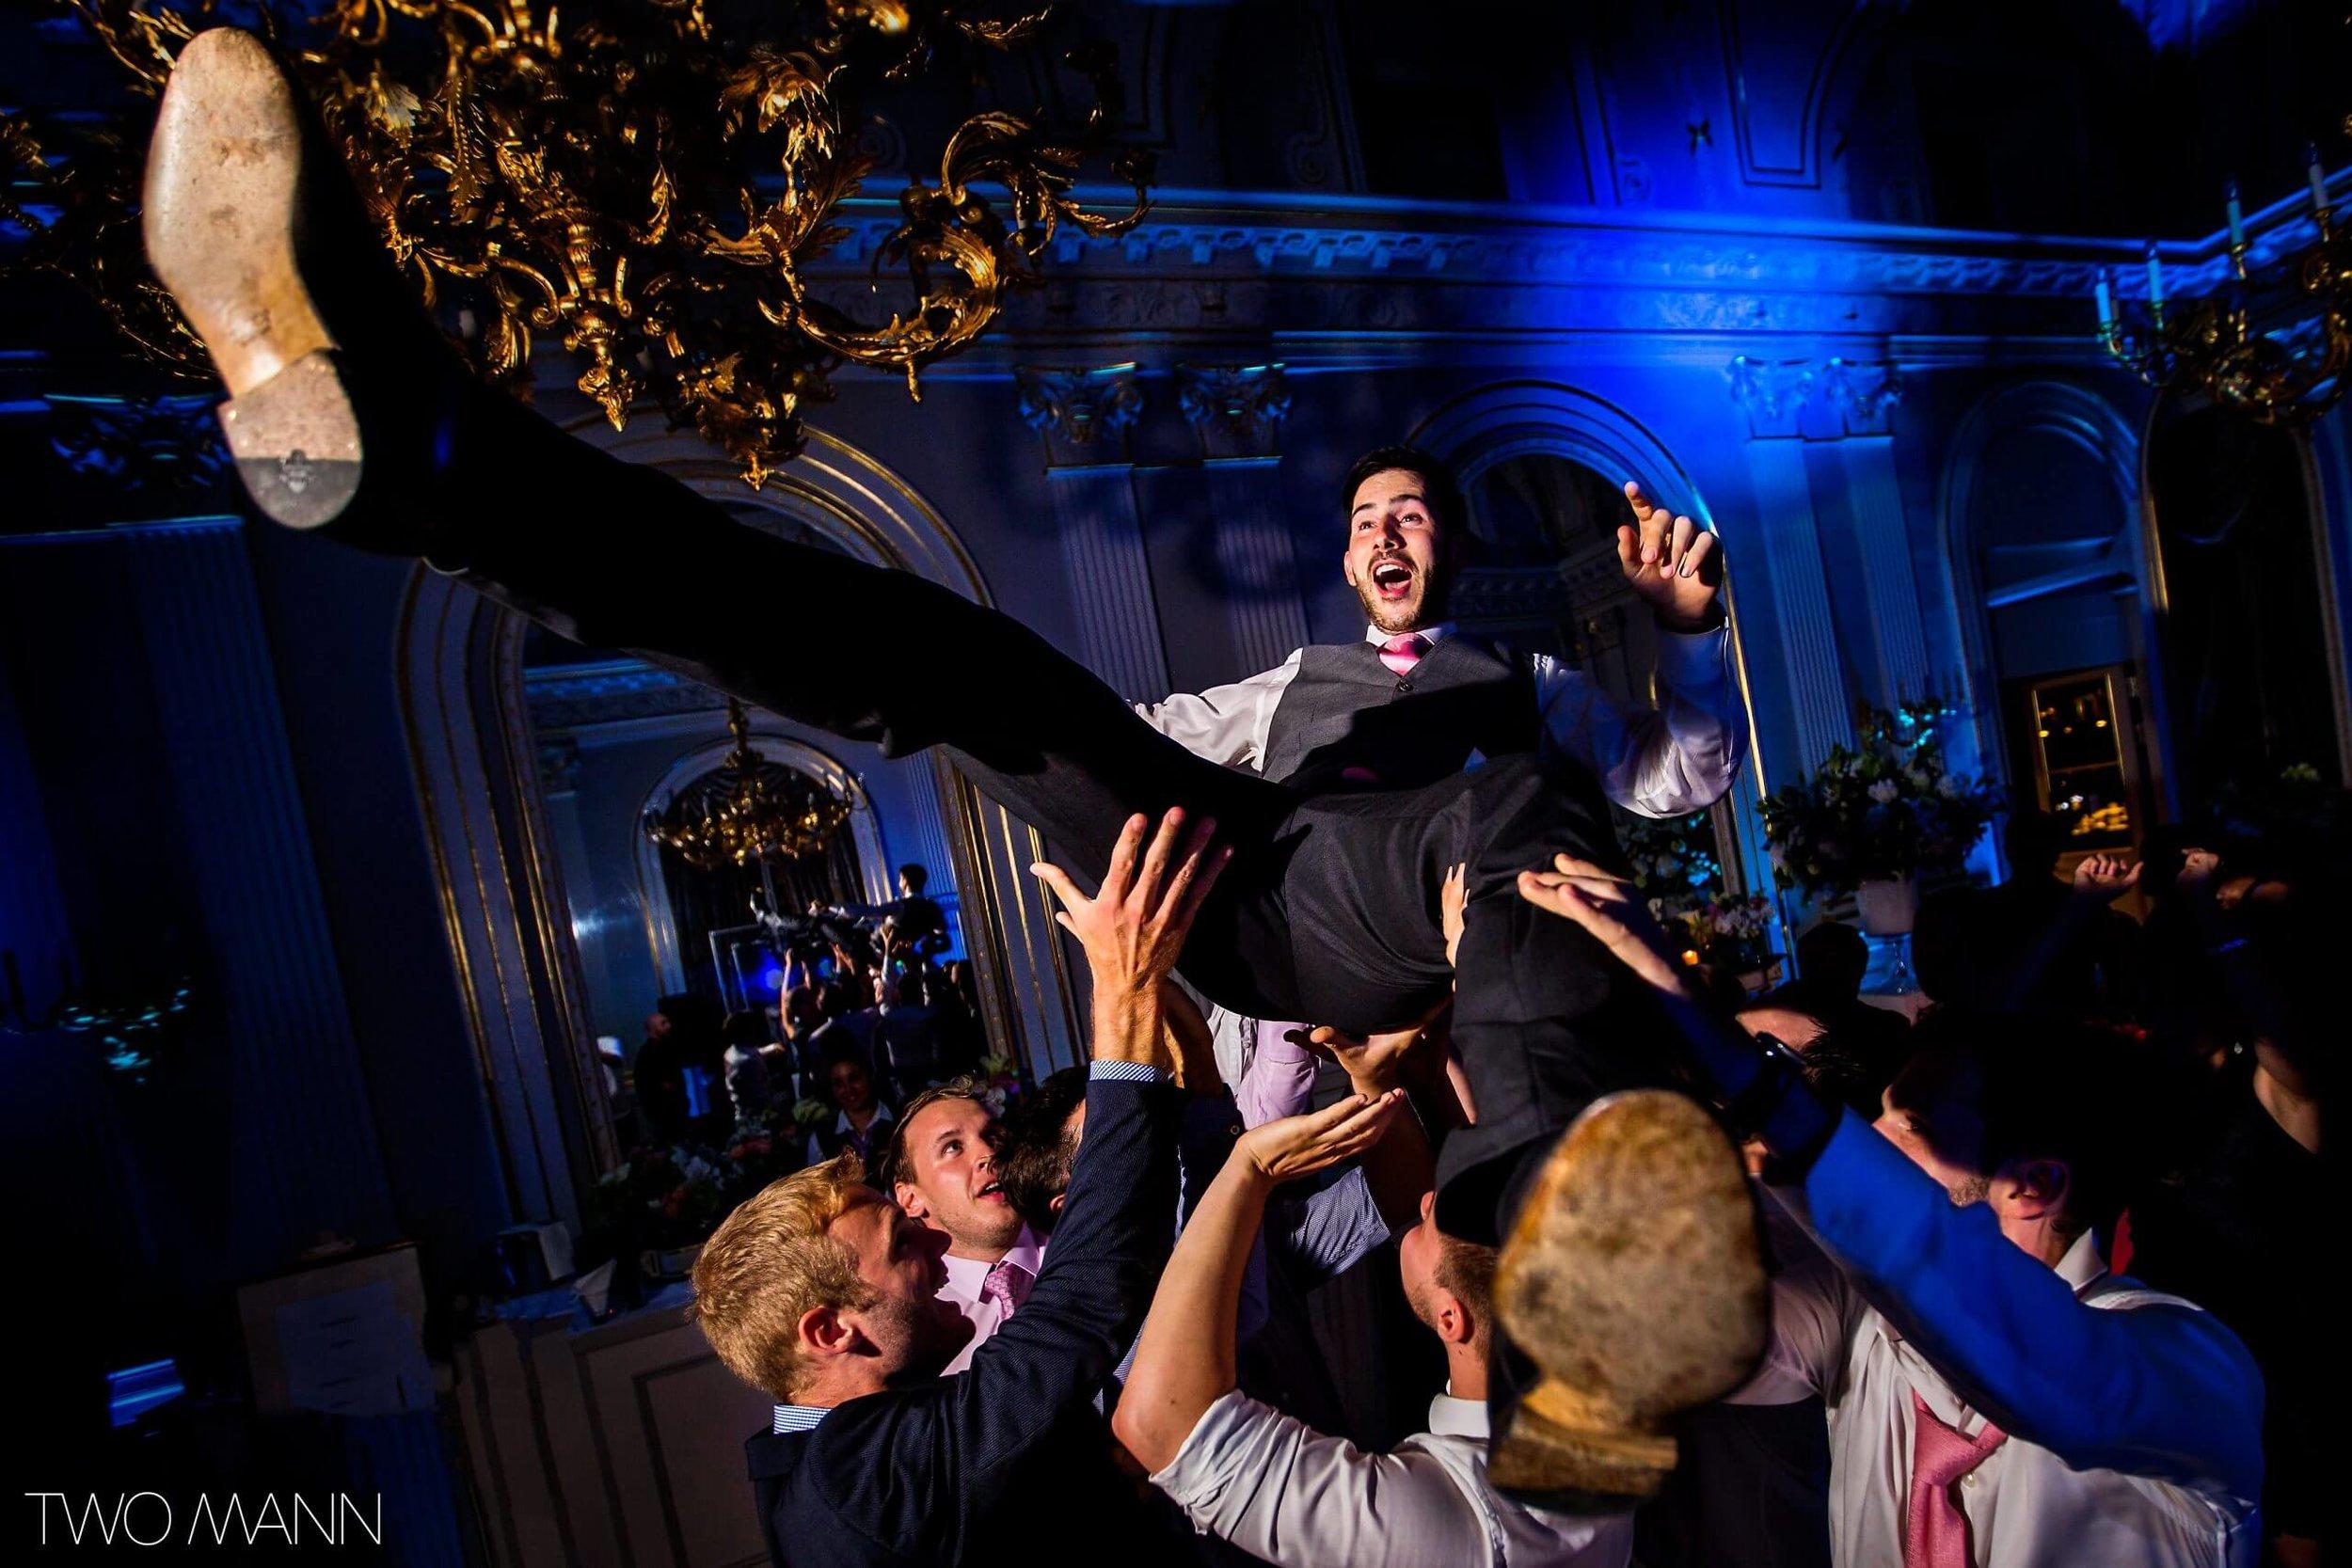 Two-Mann-Studios-Worlds-Best-Wedding-Photography-Best-of-2016-069-2560x1707.jpg